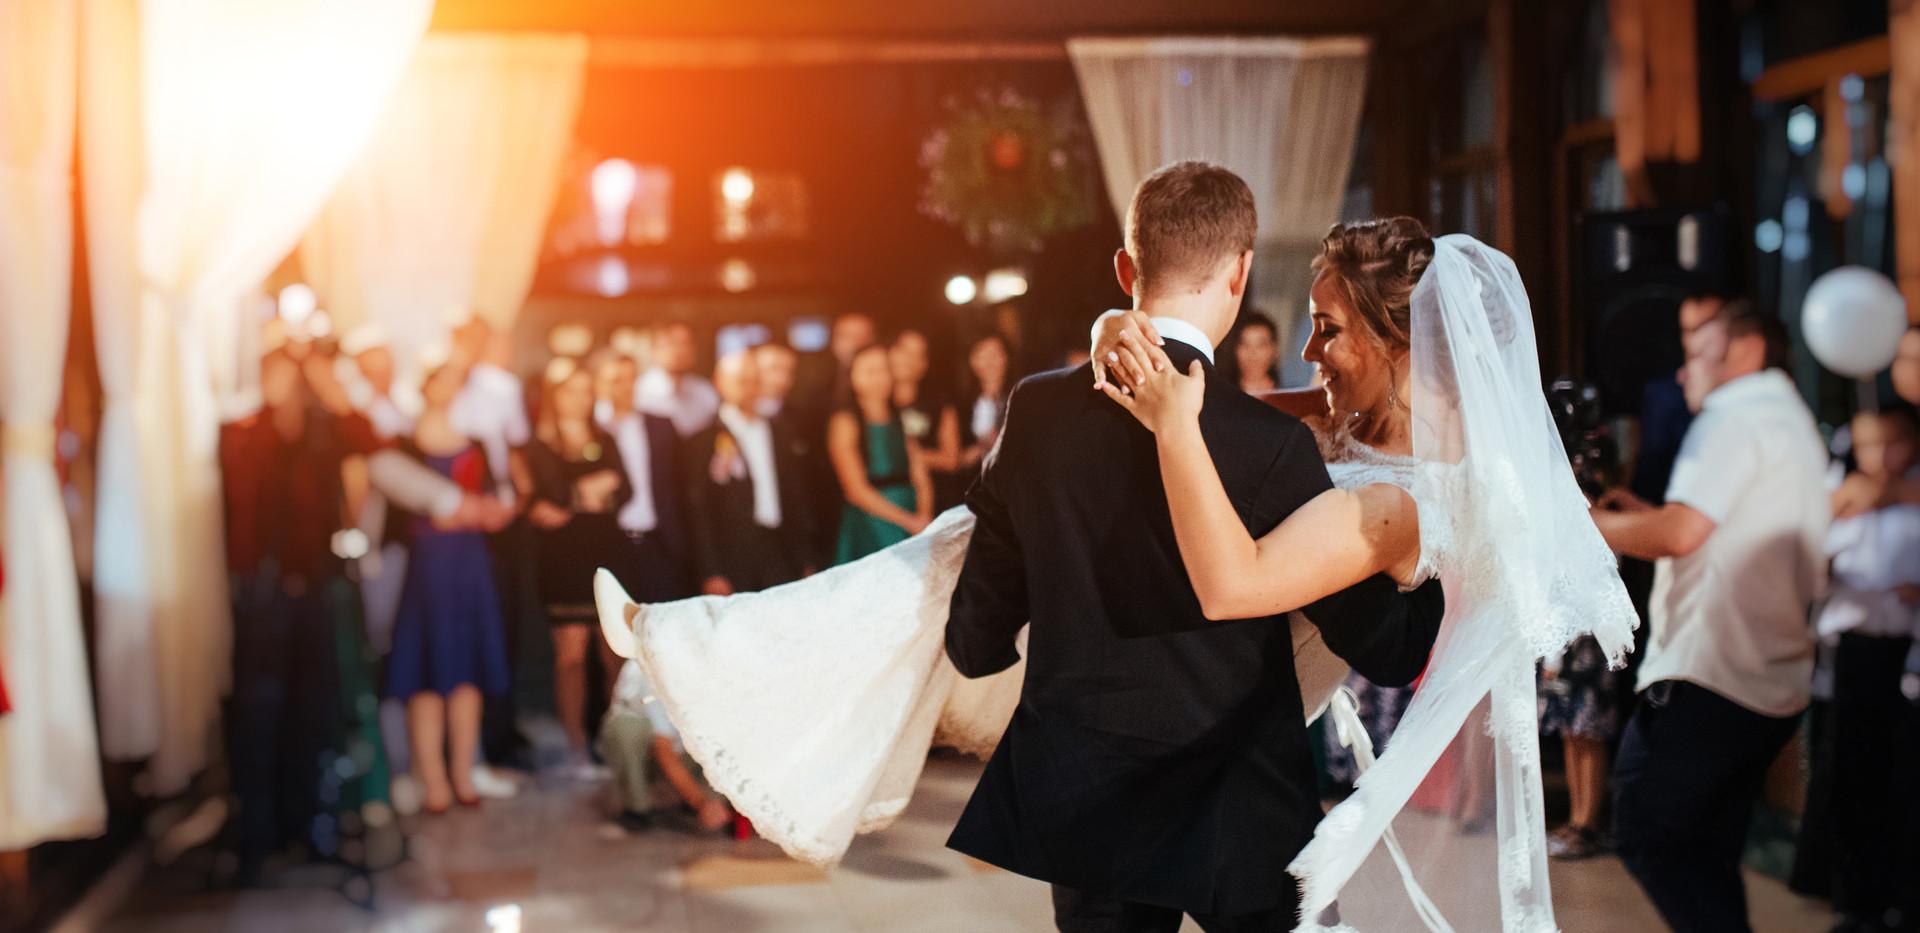 Wedding DJ Service in Surf City NC offering an affordable wedding dj.